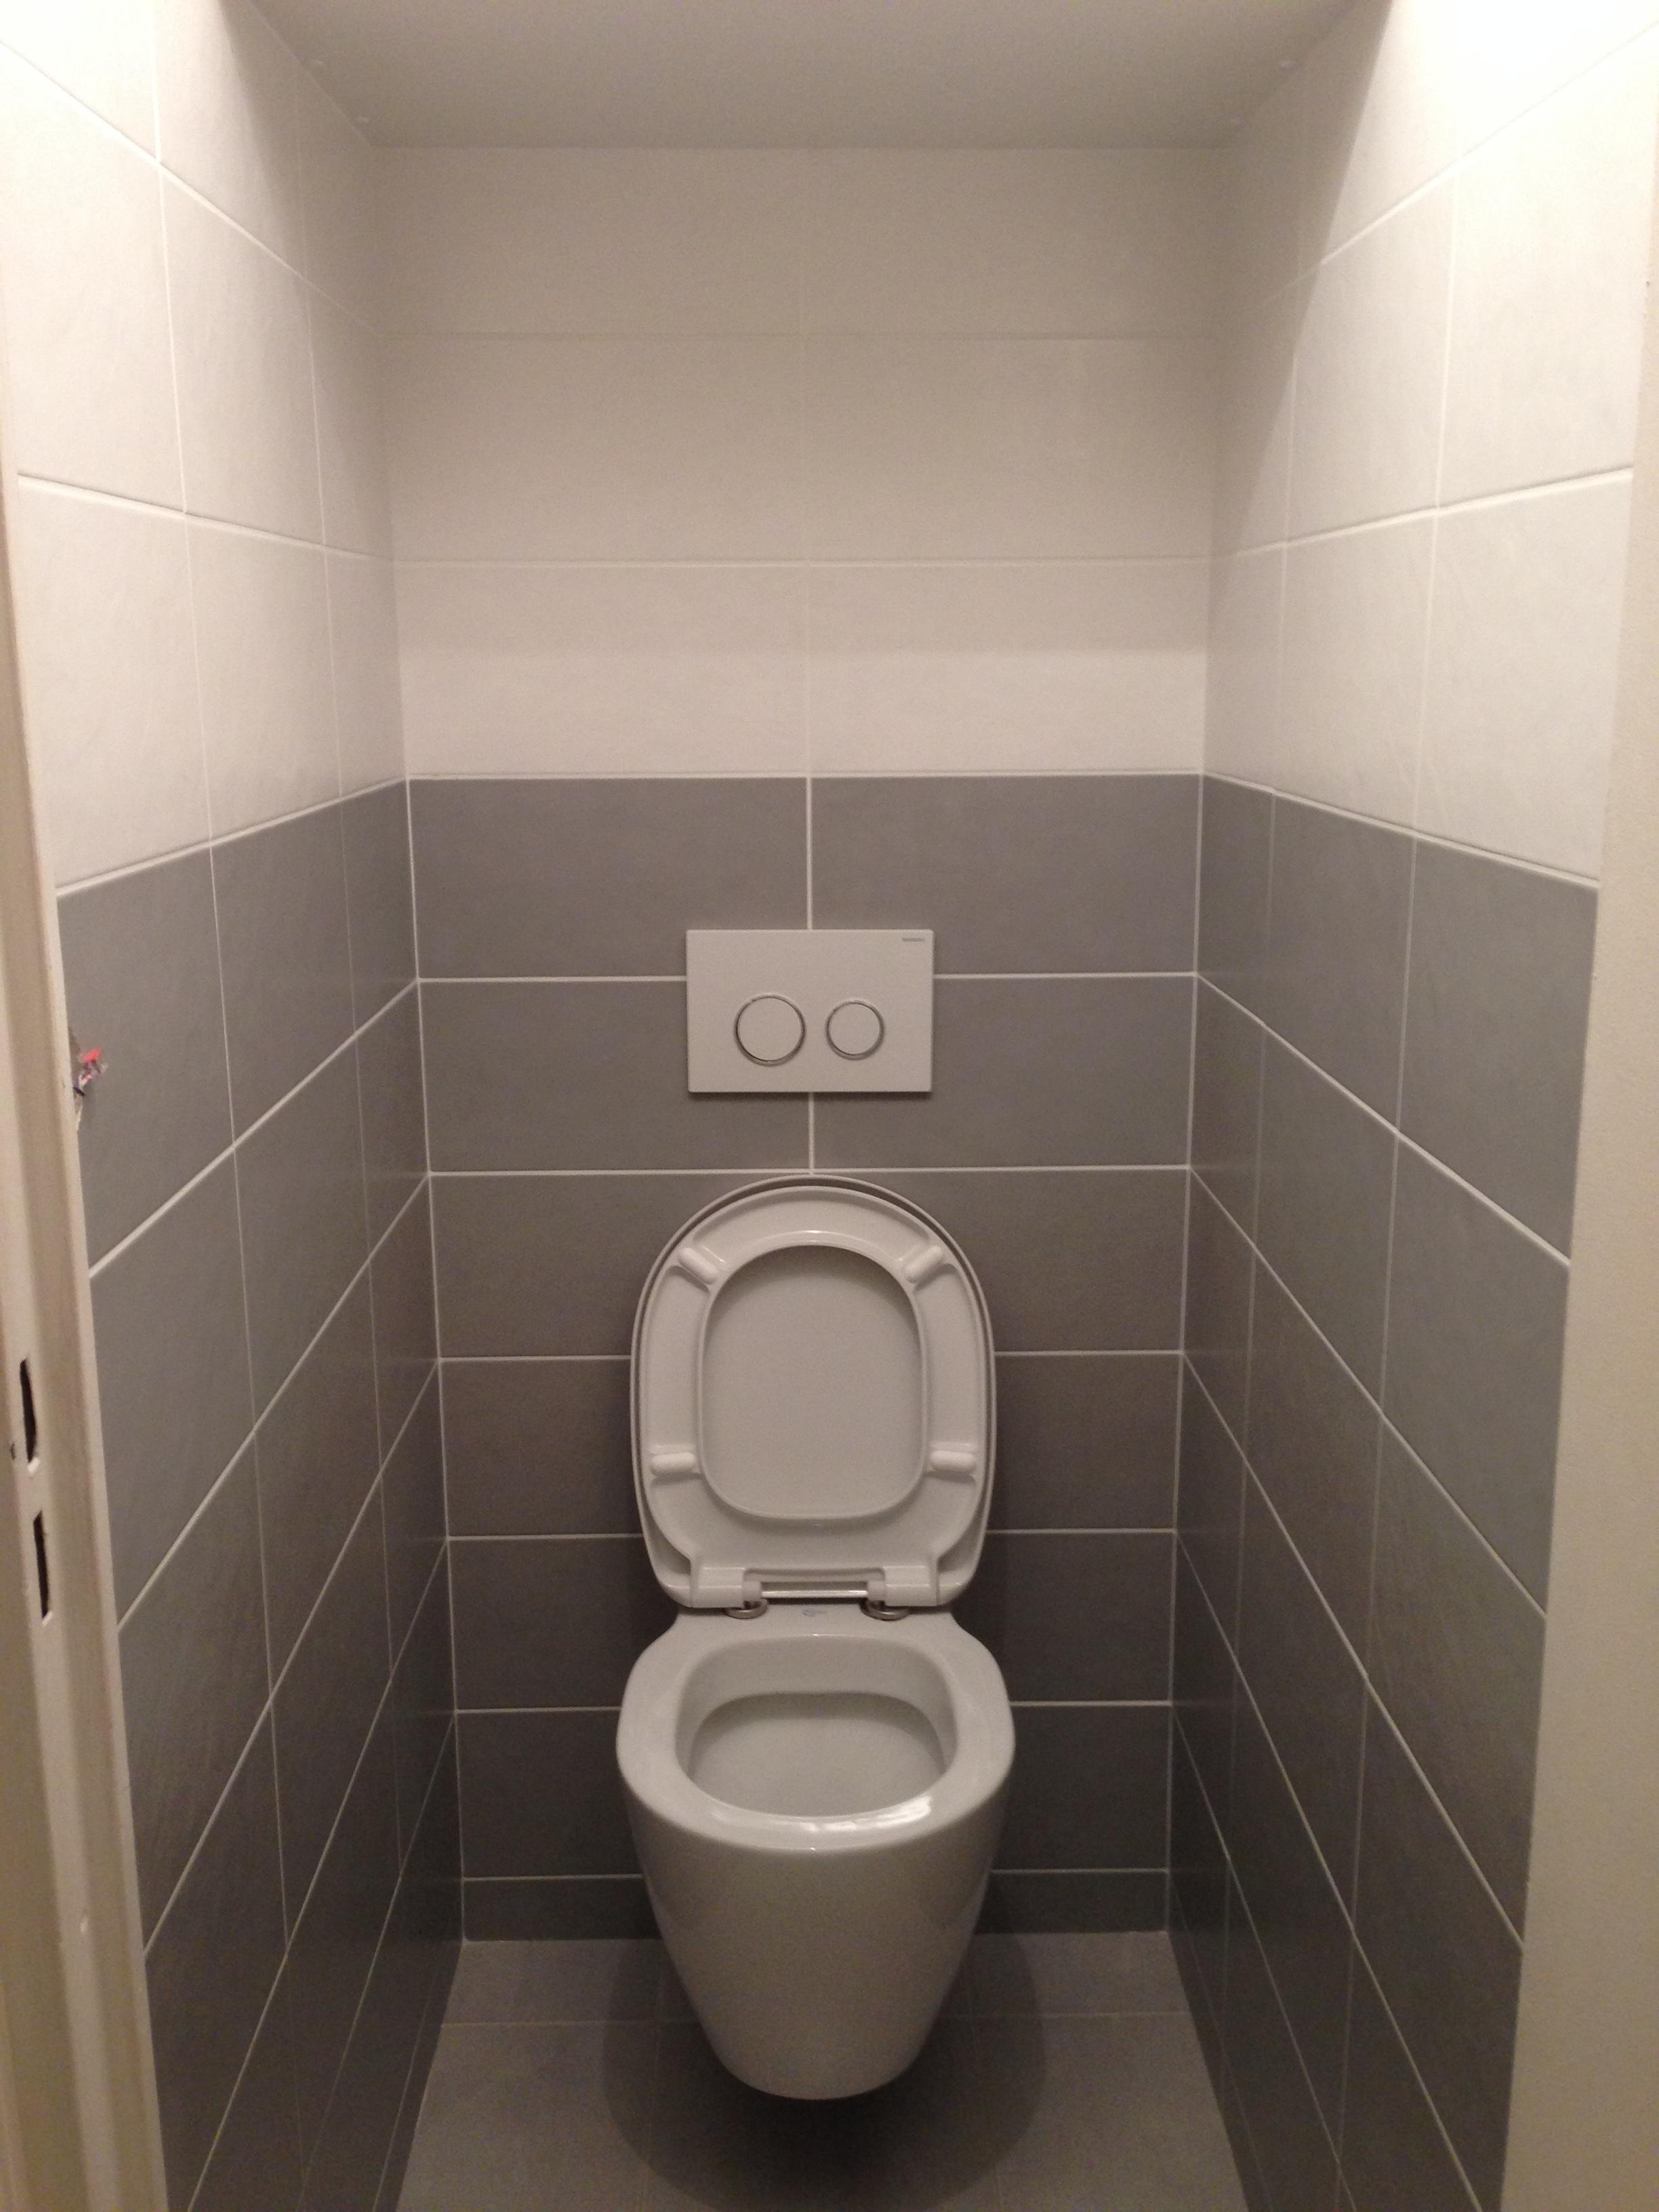 Leroy Merlin Armoire De toilette Beau Photos Carrelage Renovation Leroy Merlin Awesome Mesmerizing Beton Cire €